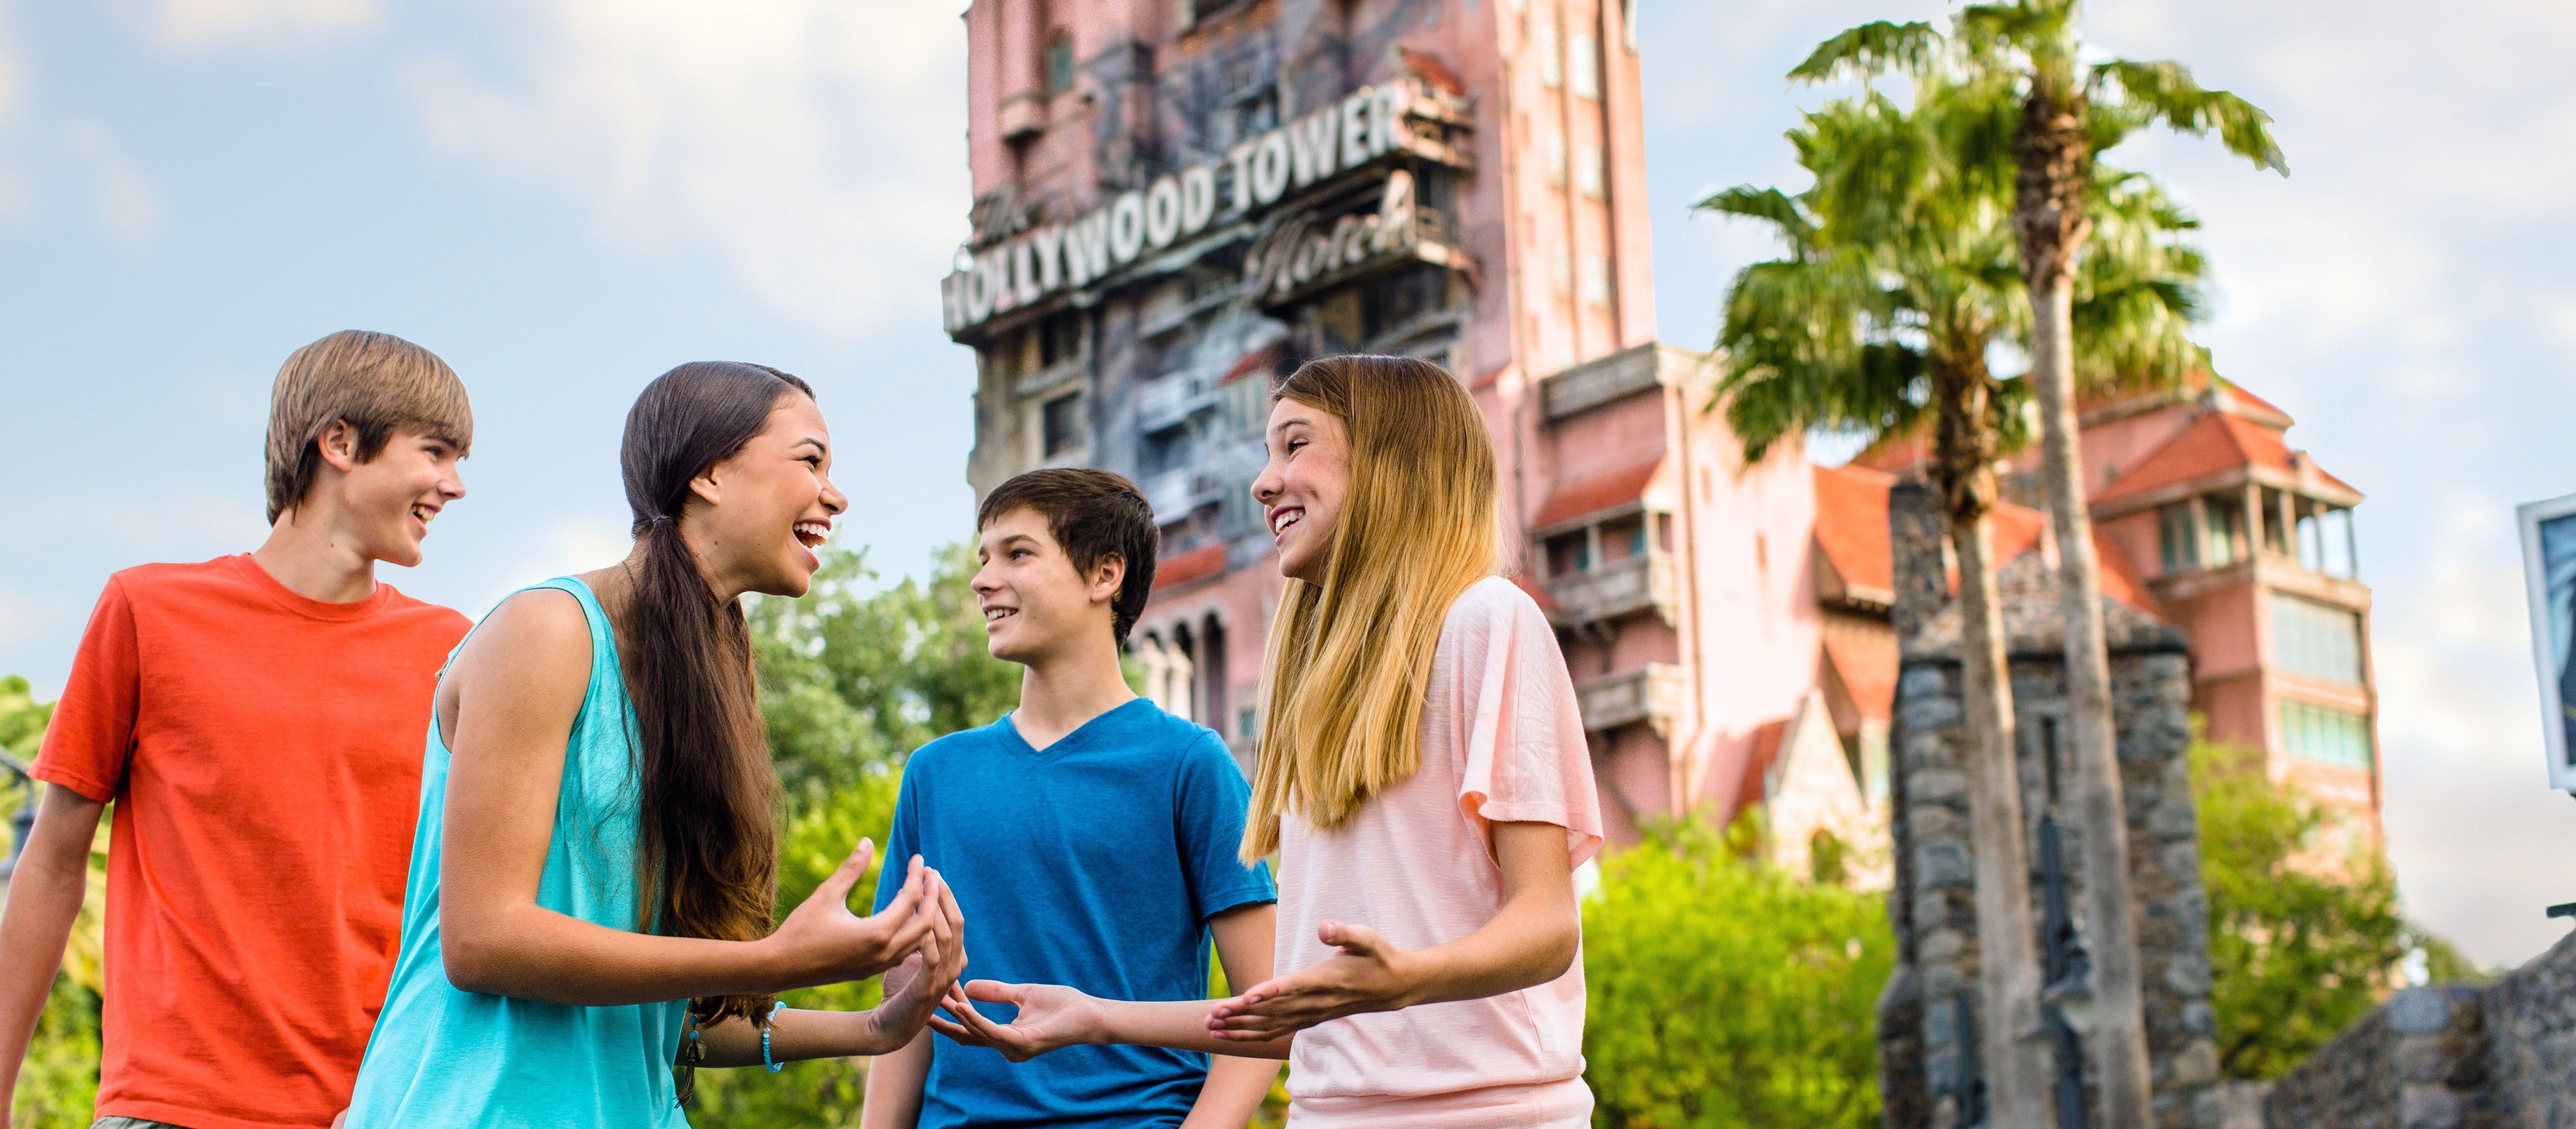 Tower of Terror, Disney Hollywood Studios, Orlando